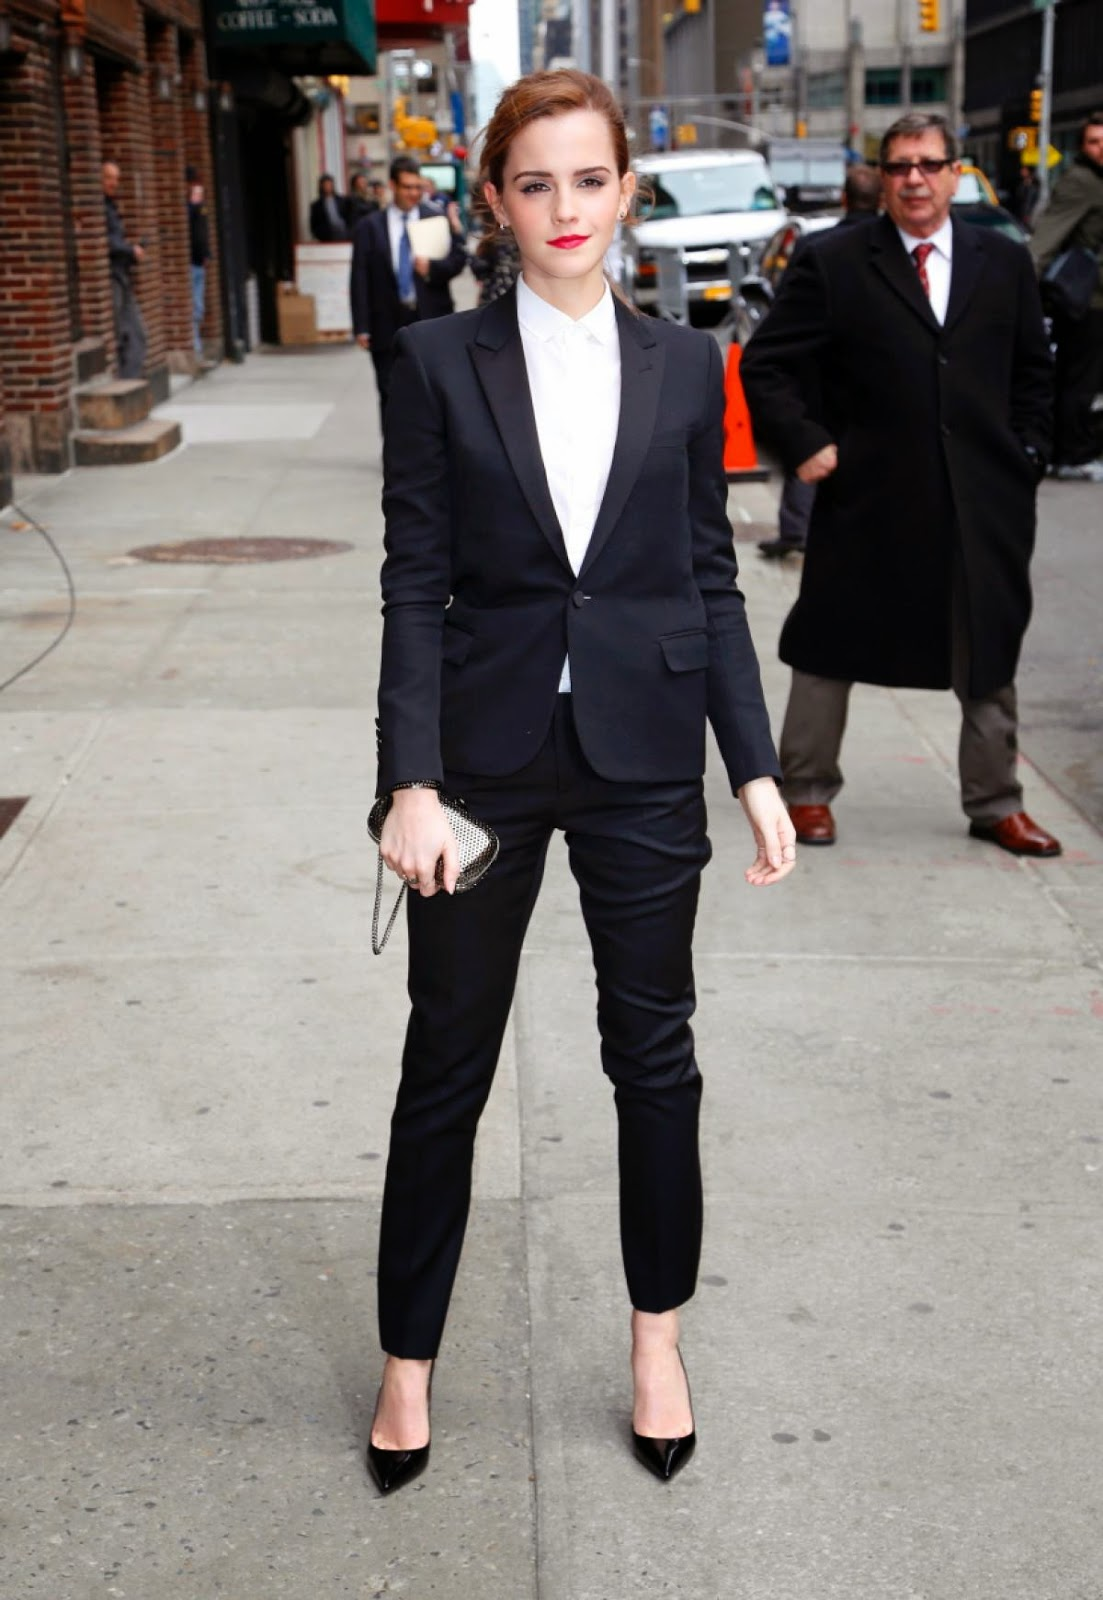 emma watson modest style modest celerity looks hijab tznius frum lds mormon penticostal fashion